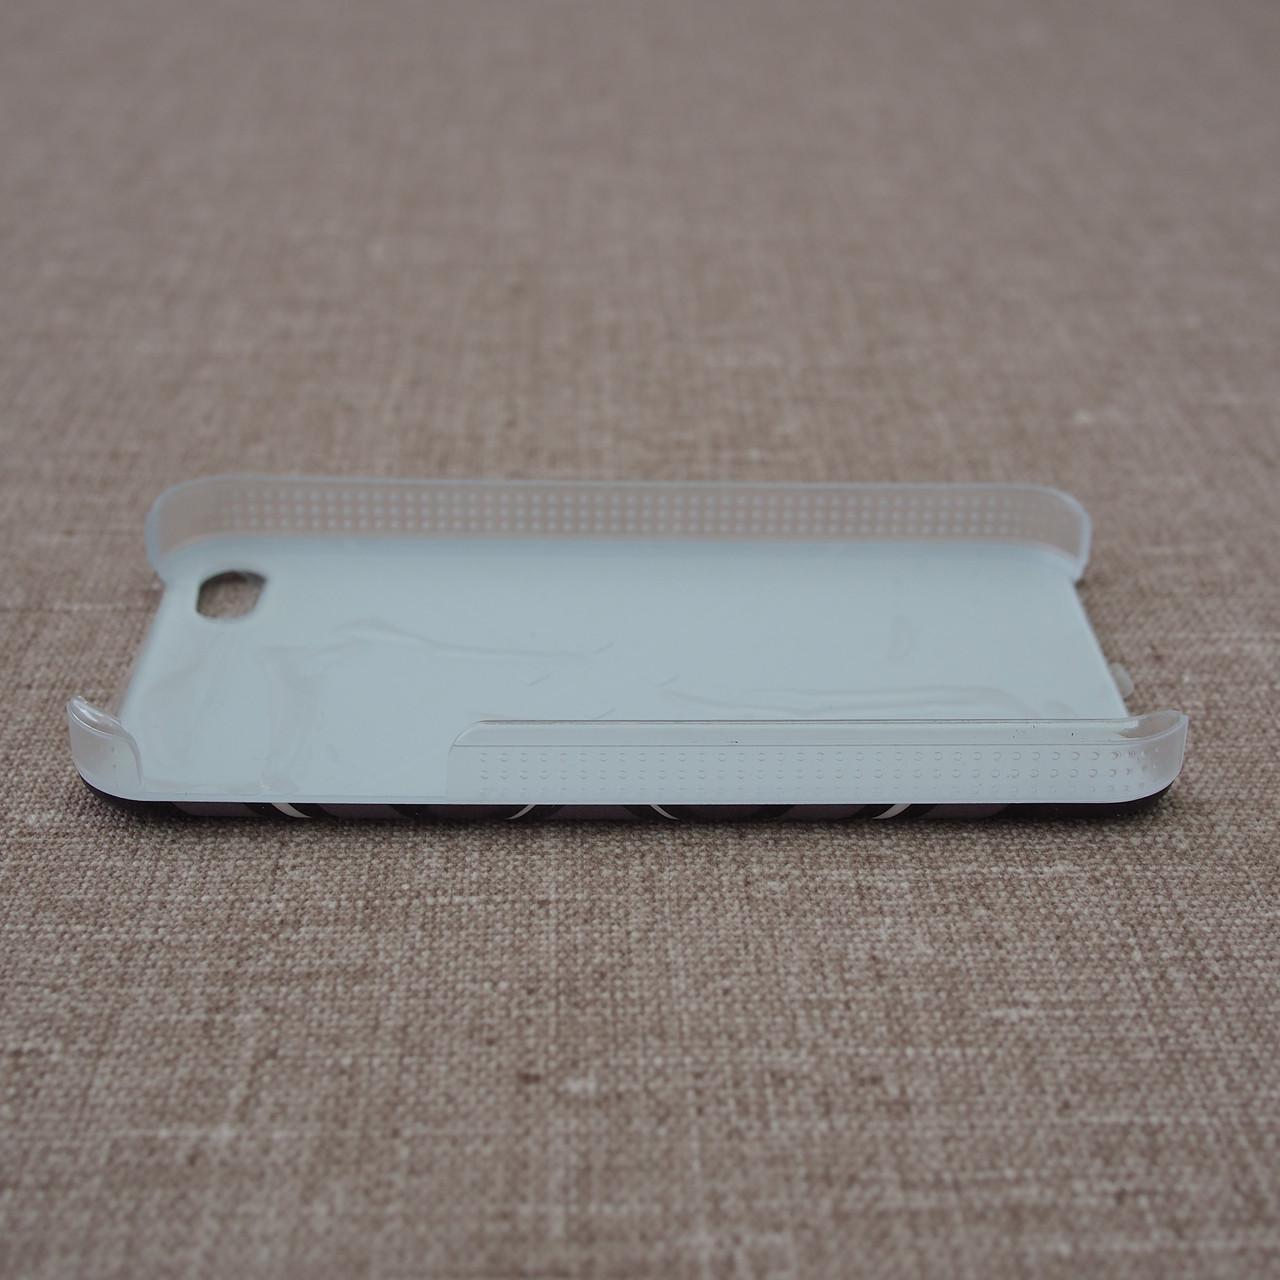 White Diamonds Grid black iPhone 4 4S Apple 4s